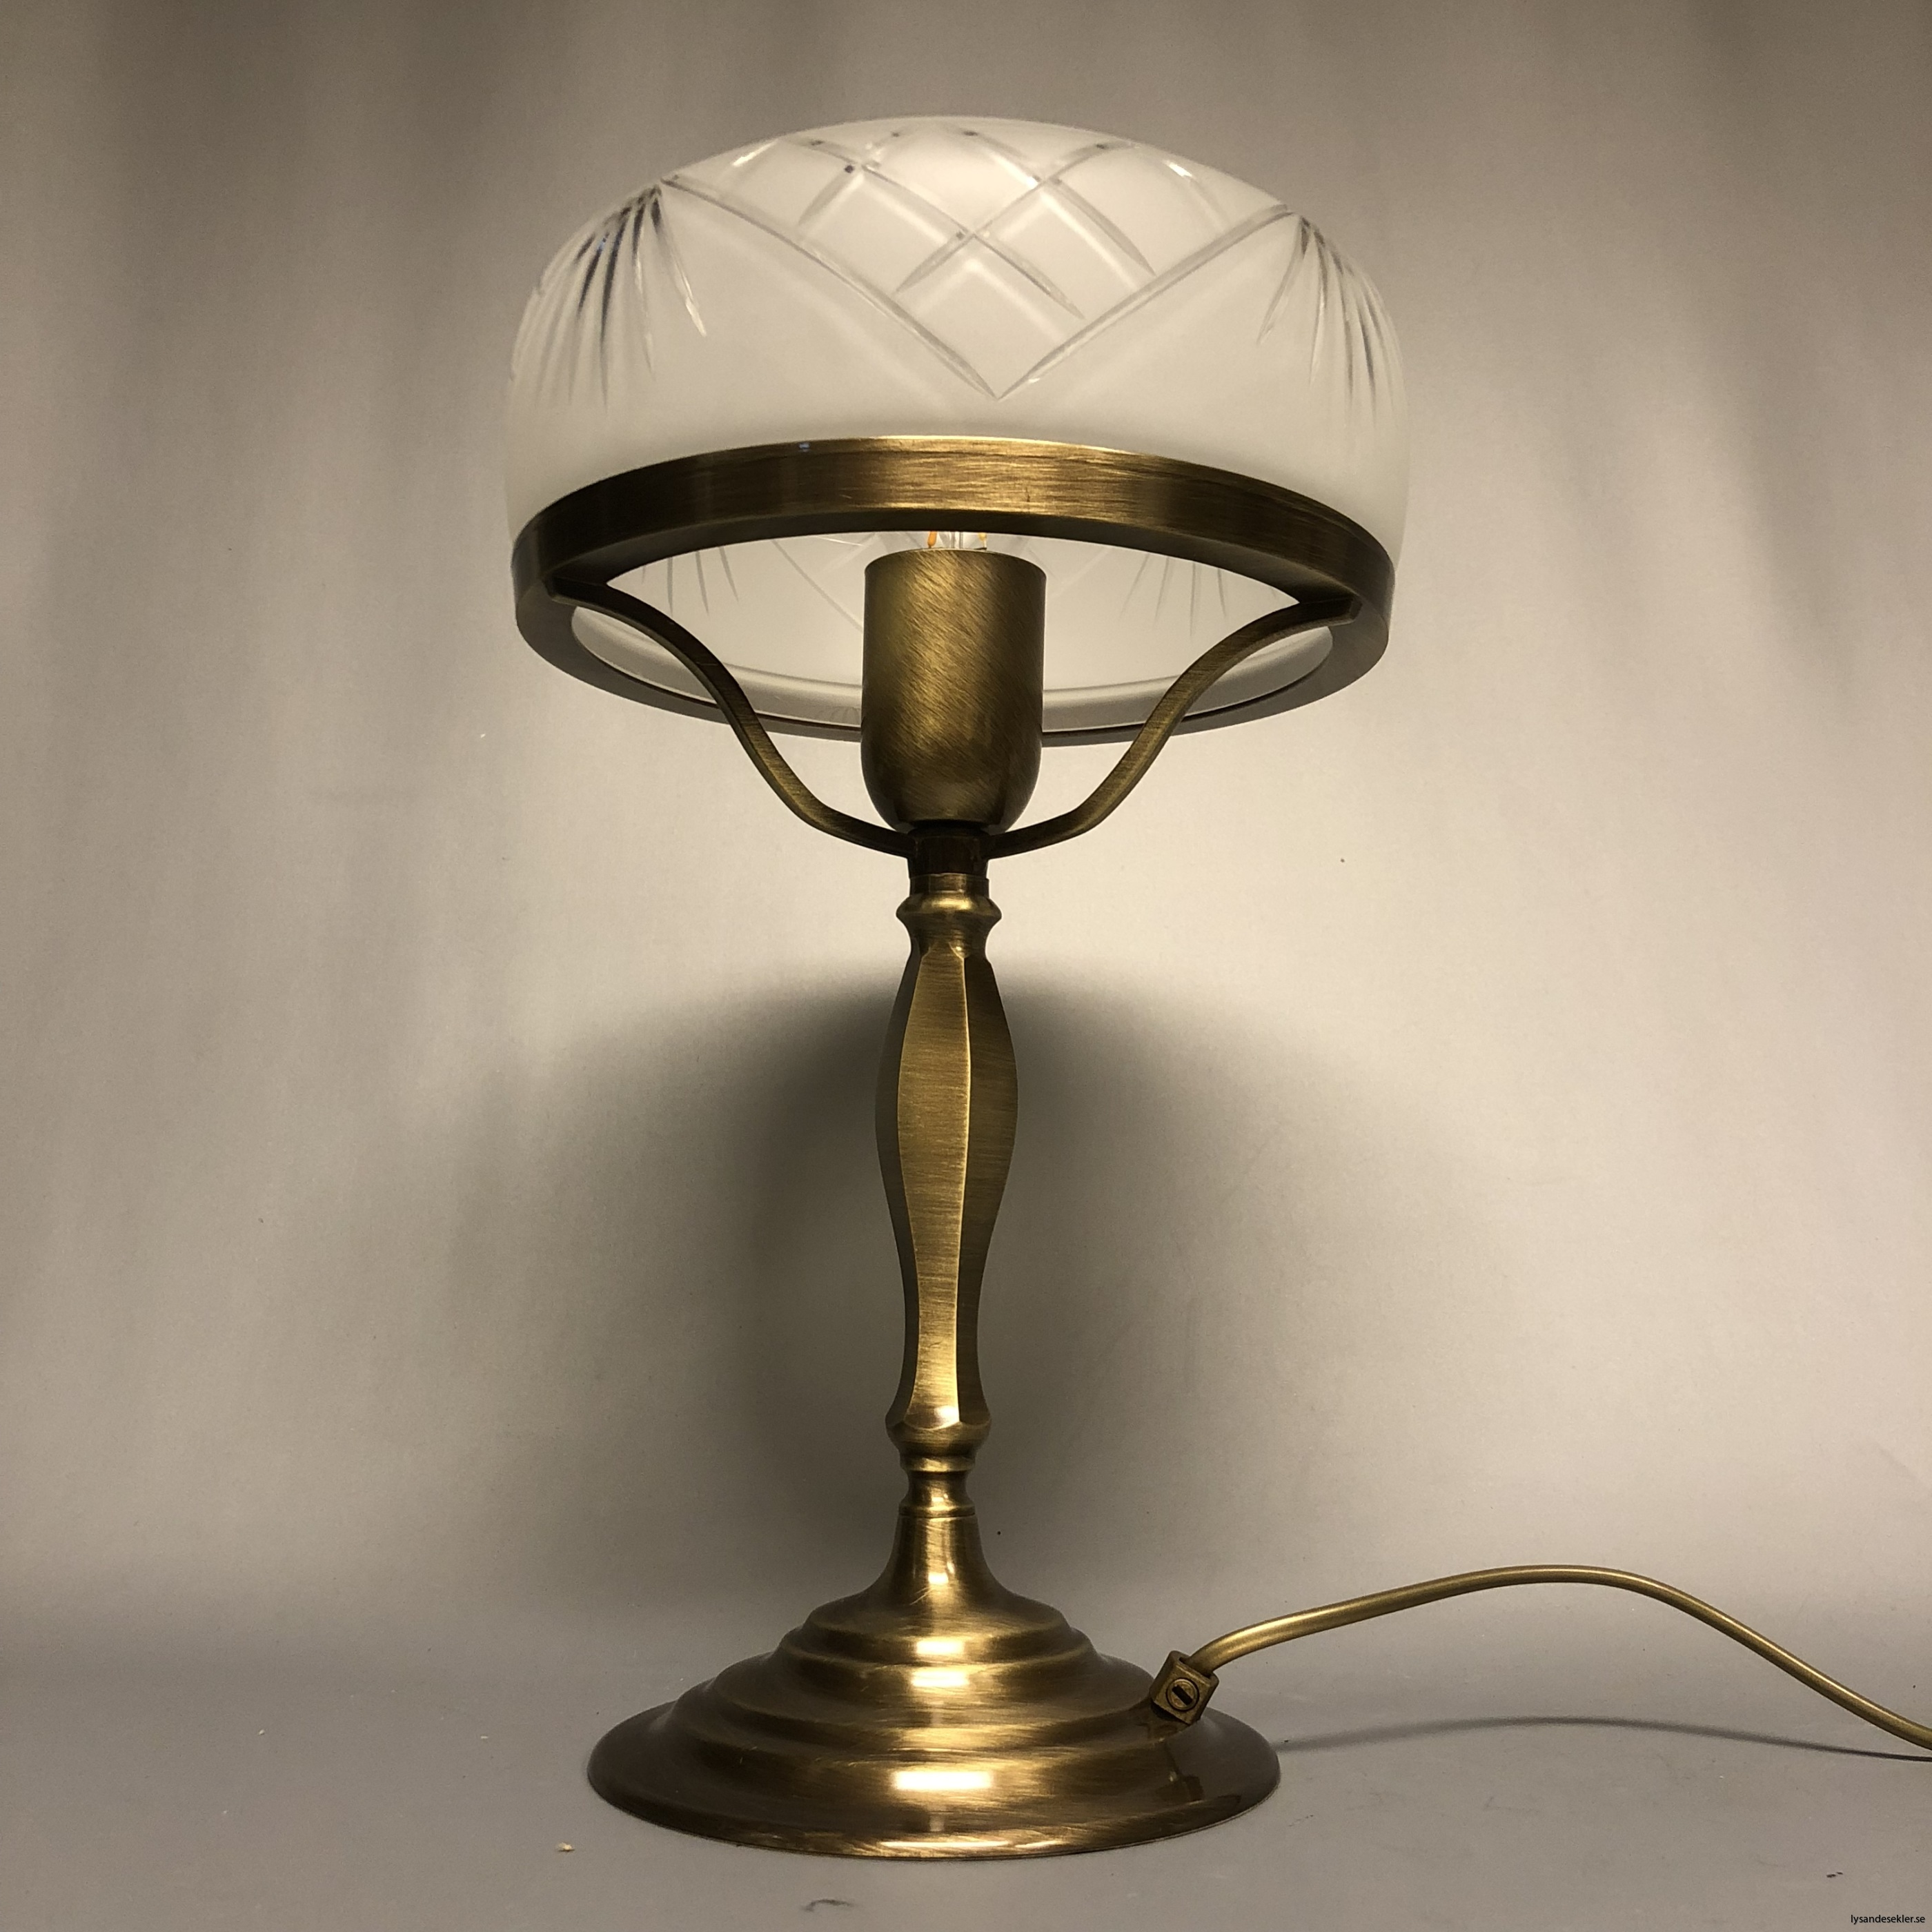 strindbergslampa strindbergslampor strindberg lampa skärm kupa strindbergsskärm strindbergskupa22